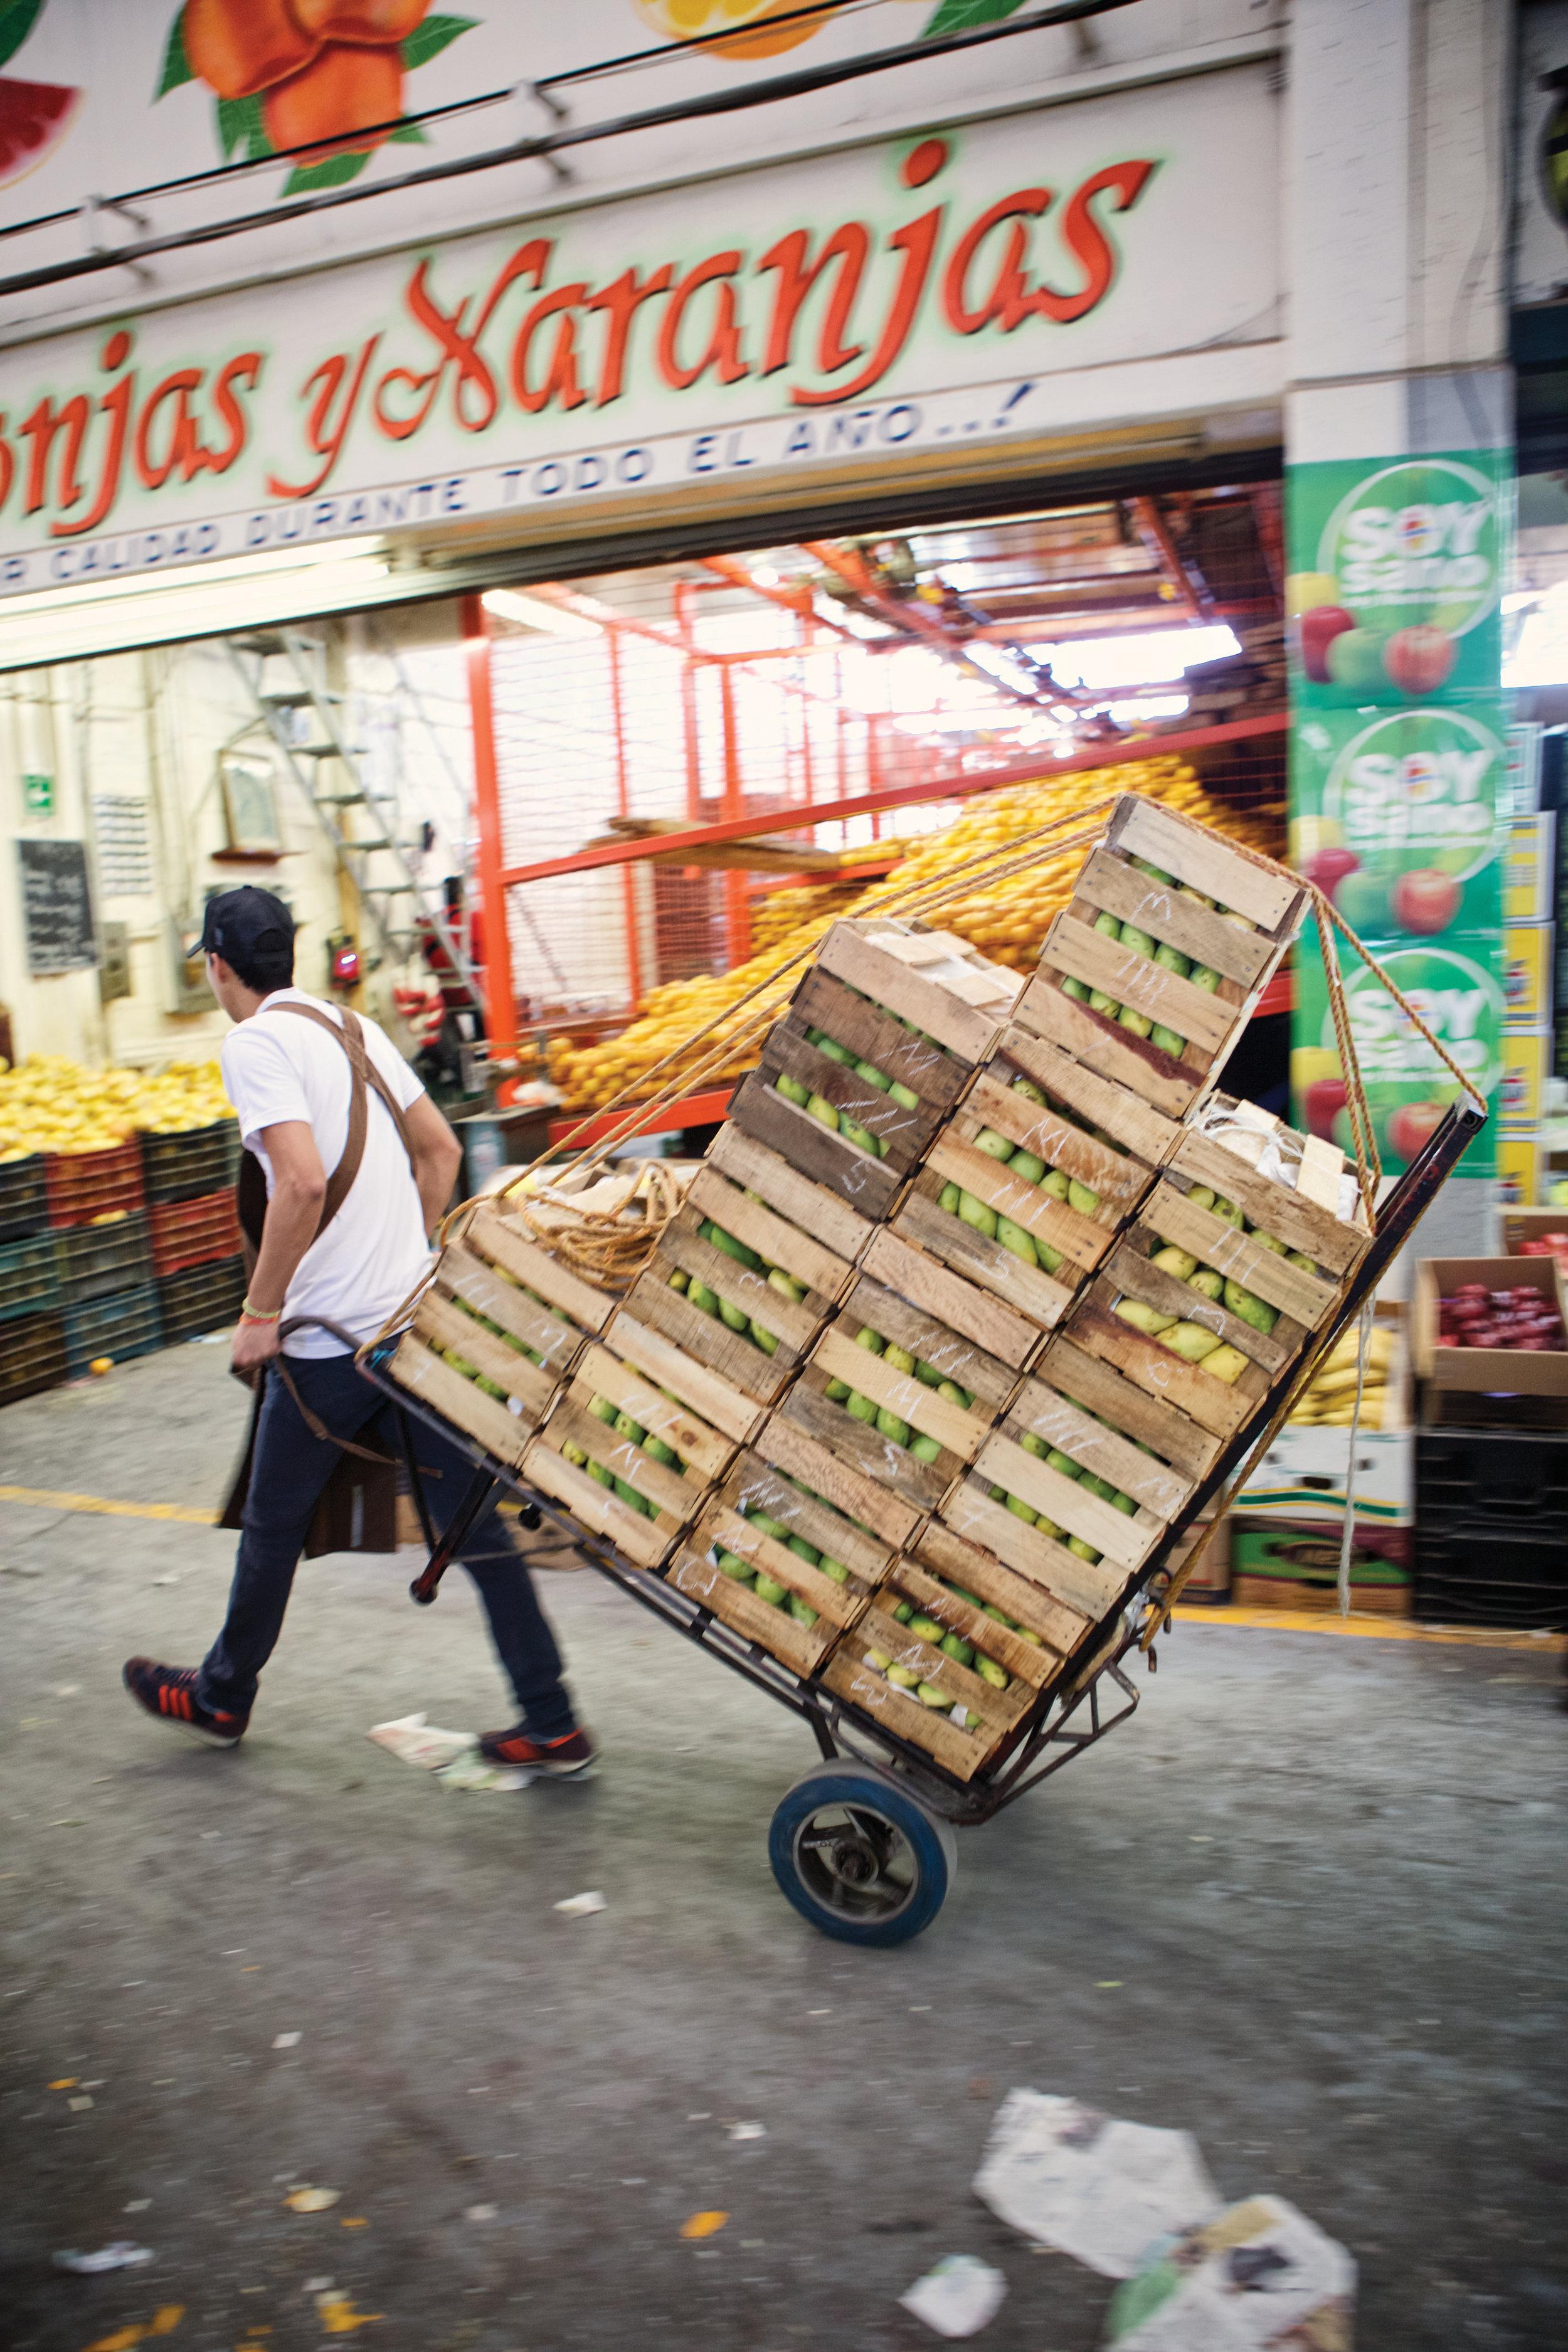 Copy of man carries cart of crates full of mangos